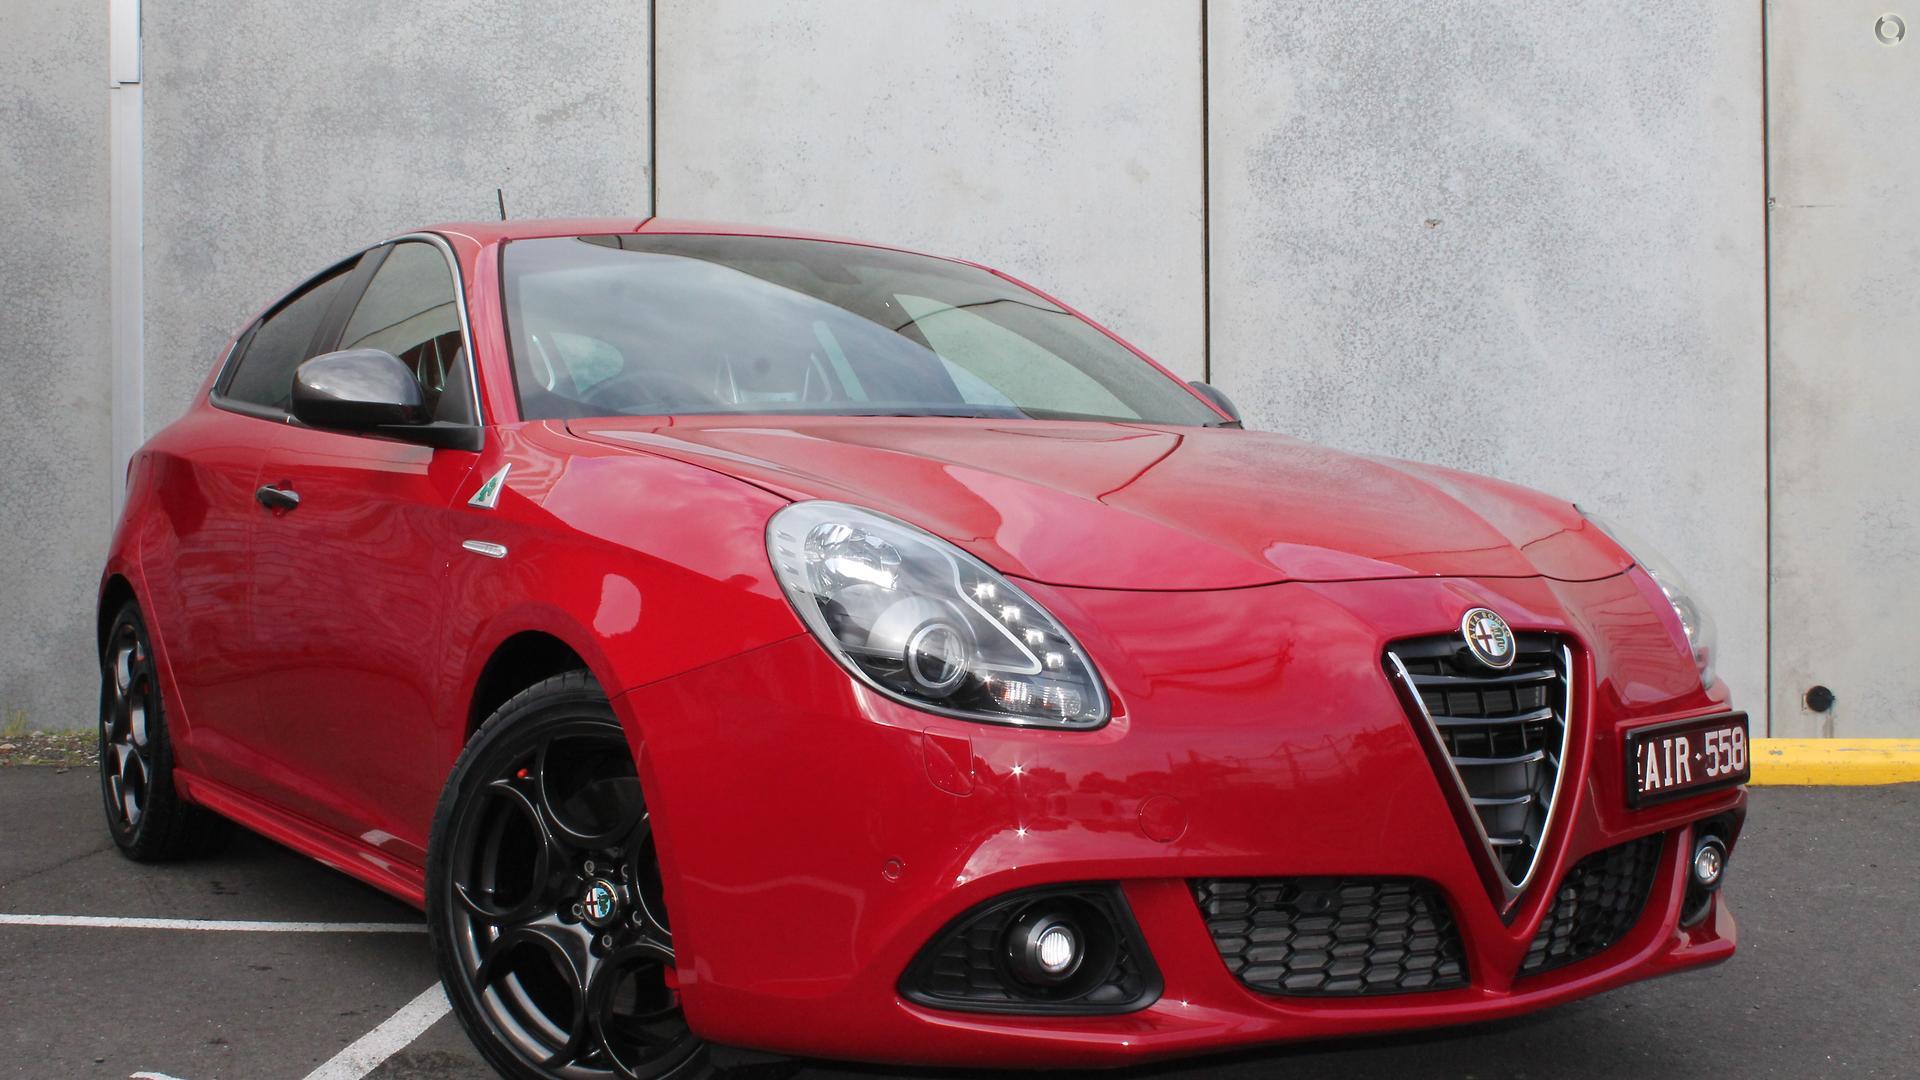 2015 Alfa Romeo Giulietta Quadrifoglio Verde Series 1